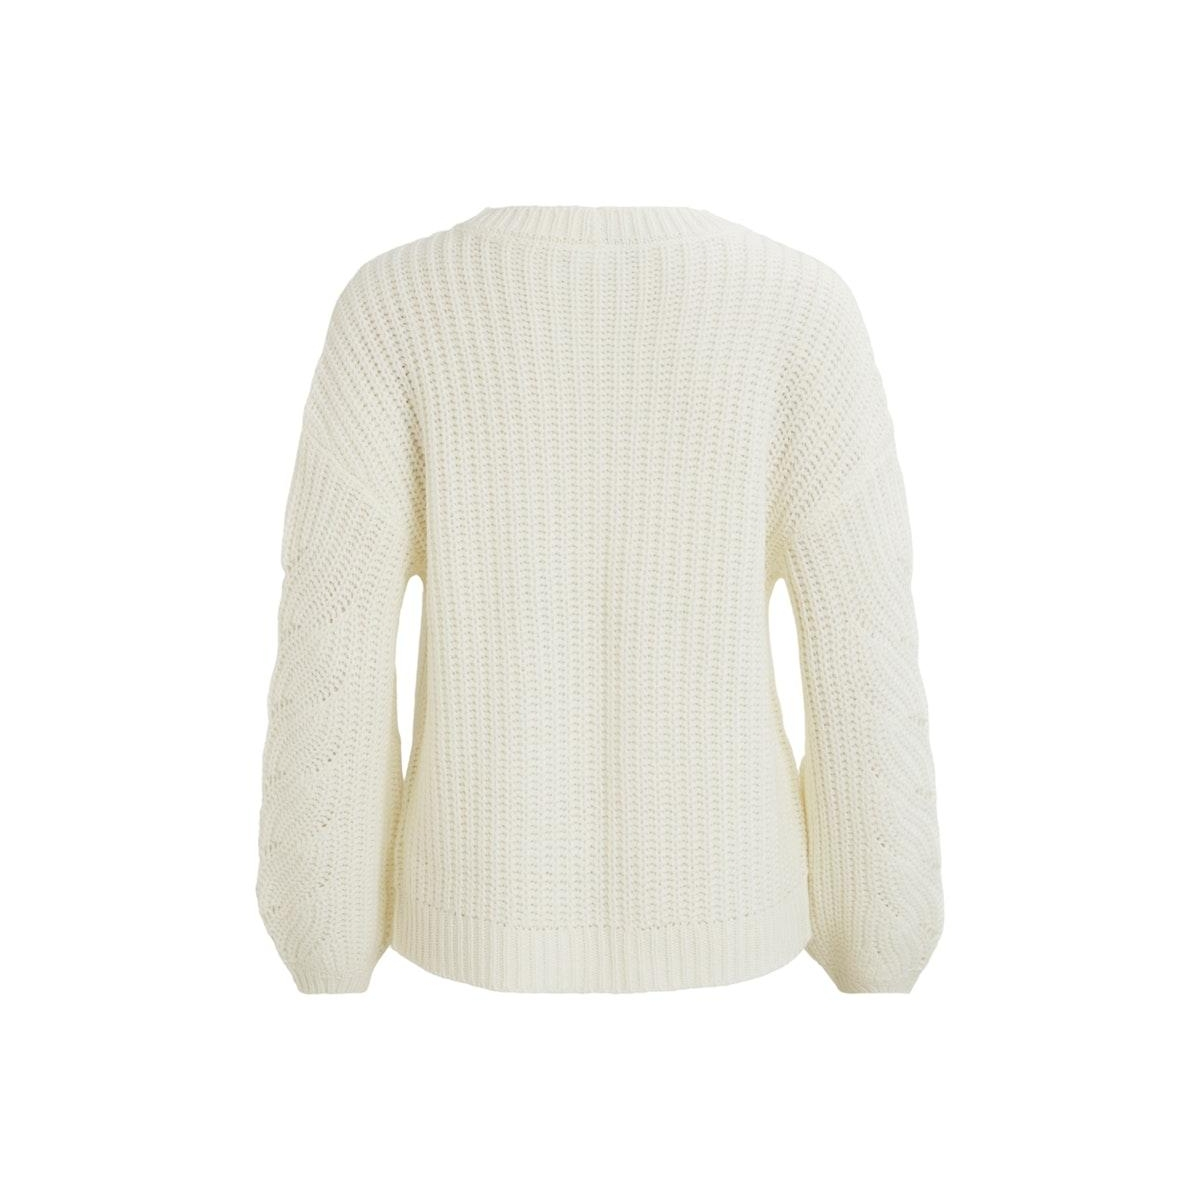 visee knit v-neck l/s cardigan 14058255 vila vest whisper white